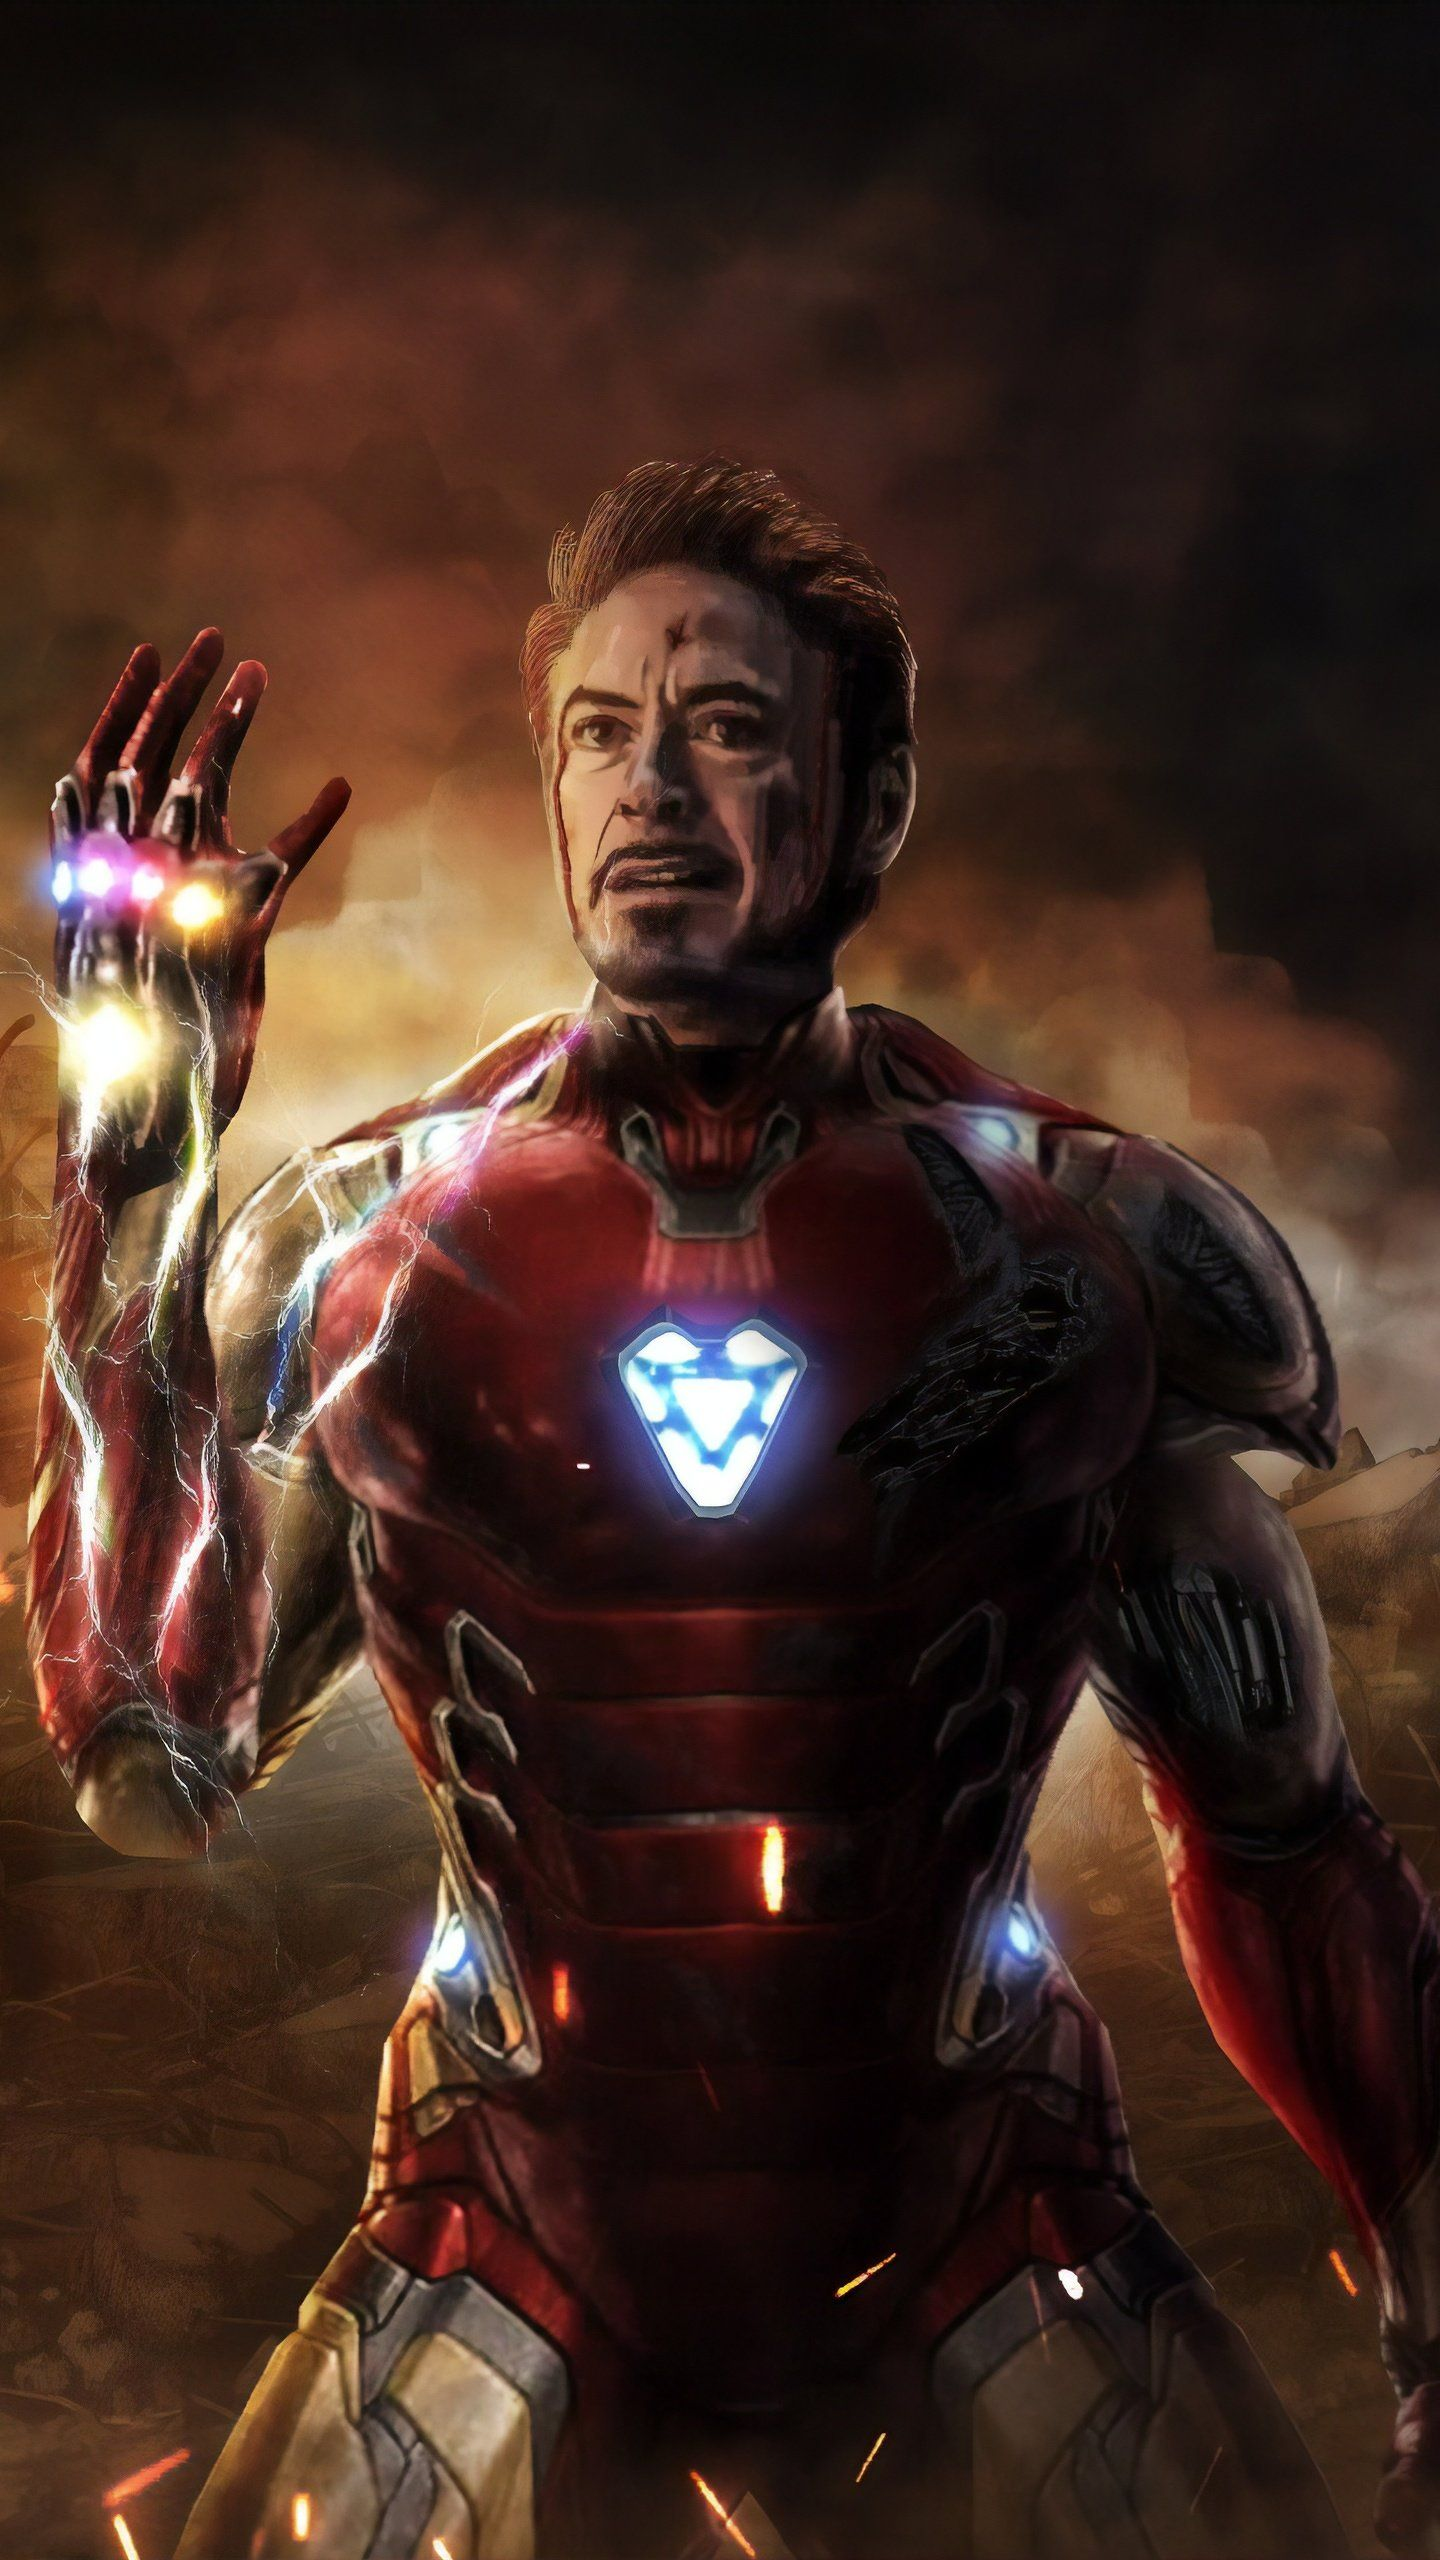 I Am Iron Man Avengers Endgame 5k Hd Wallpaper Iron Man Avengers Iron Man Photos Iron Man Wallpaper